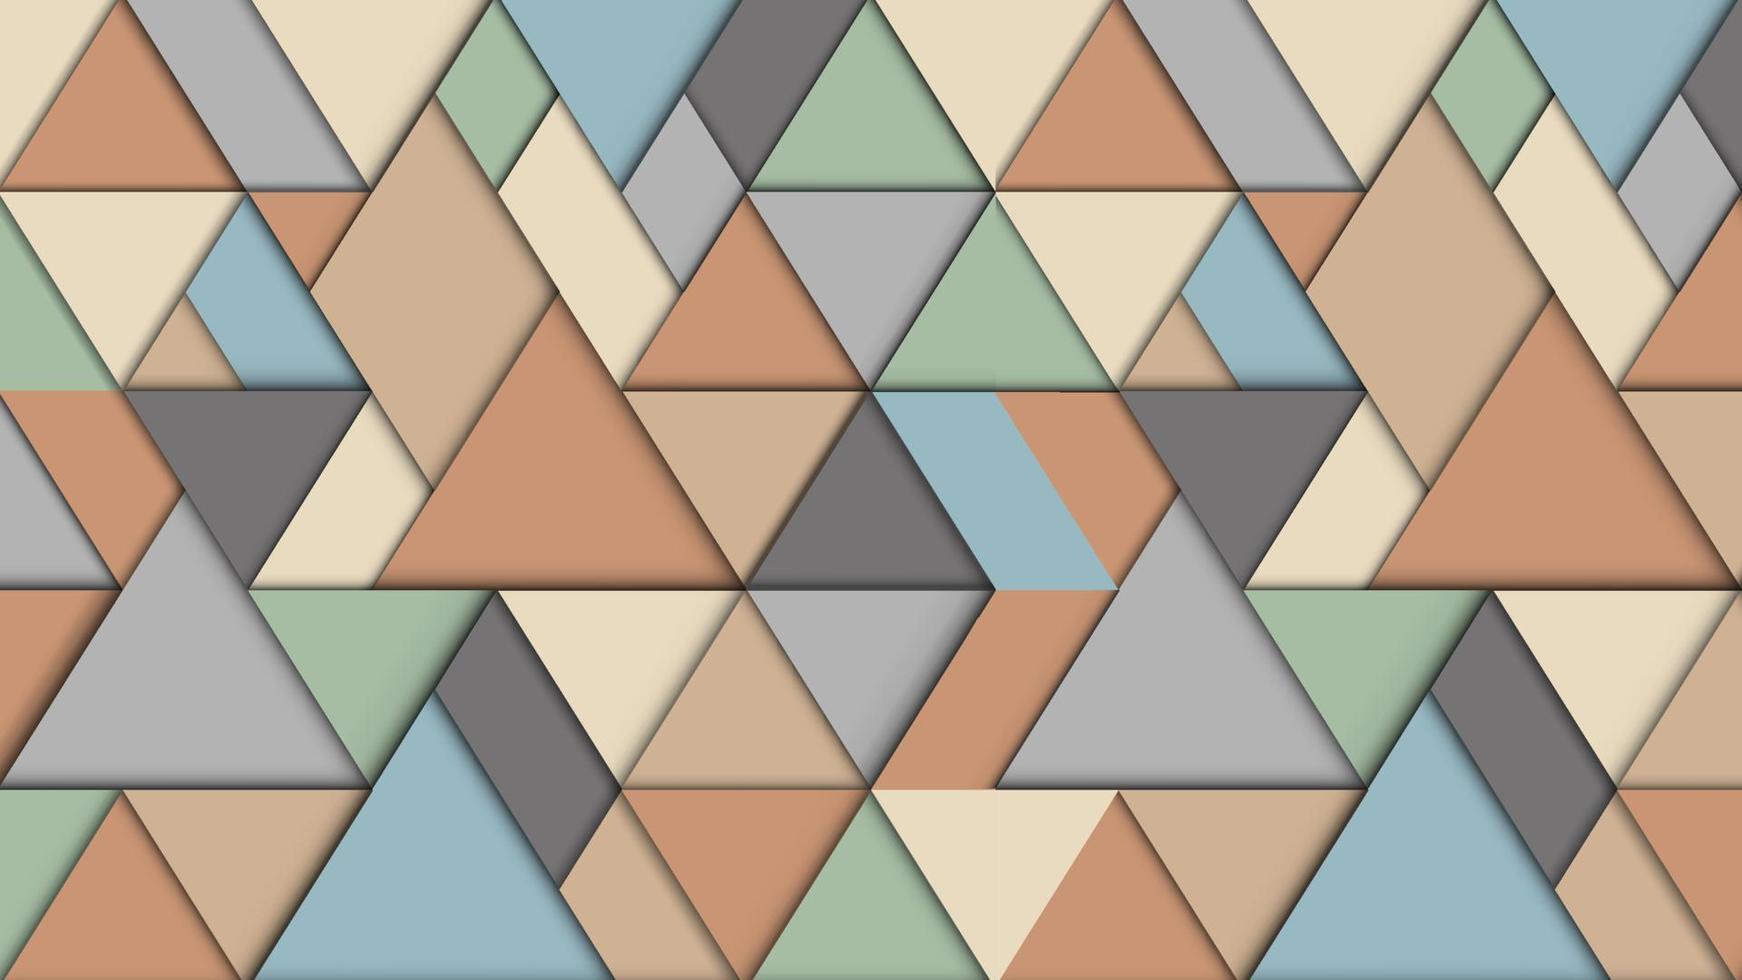 fundo abstrato geométrico com triângulos, efeito 3D, cores pastel retrô vetor